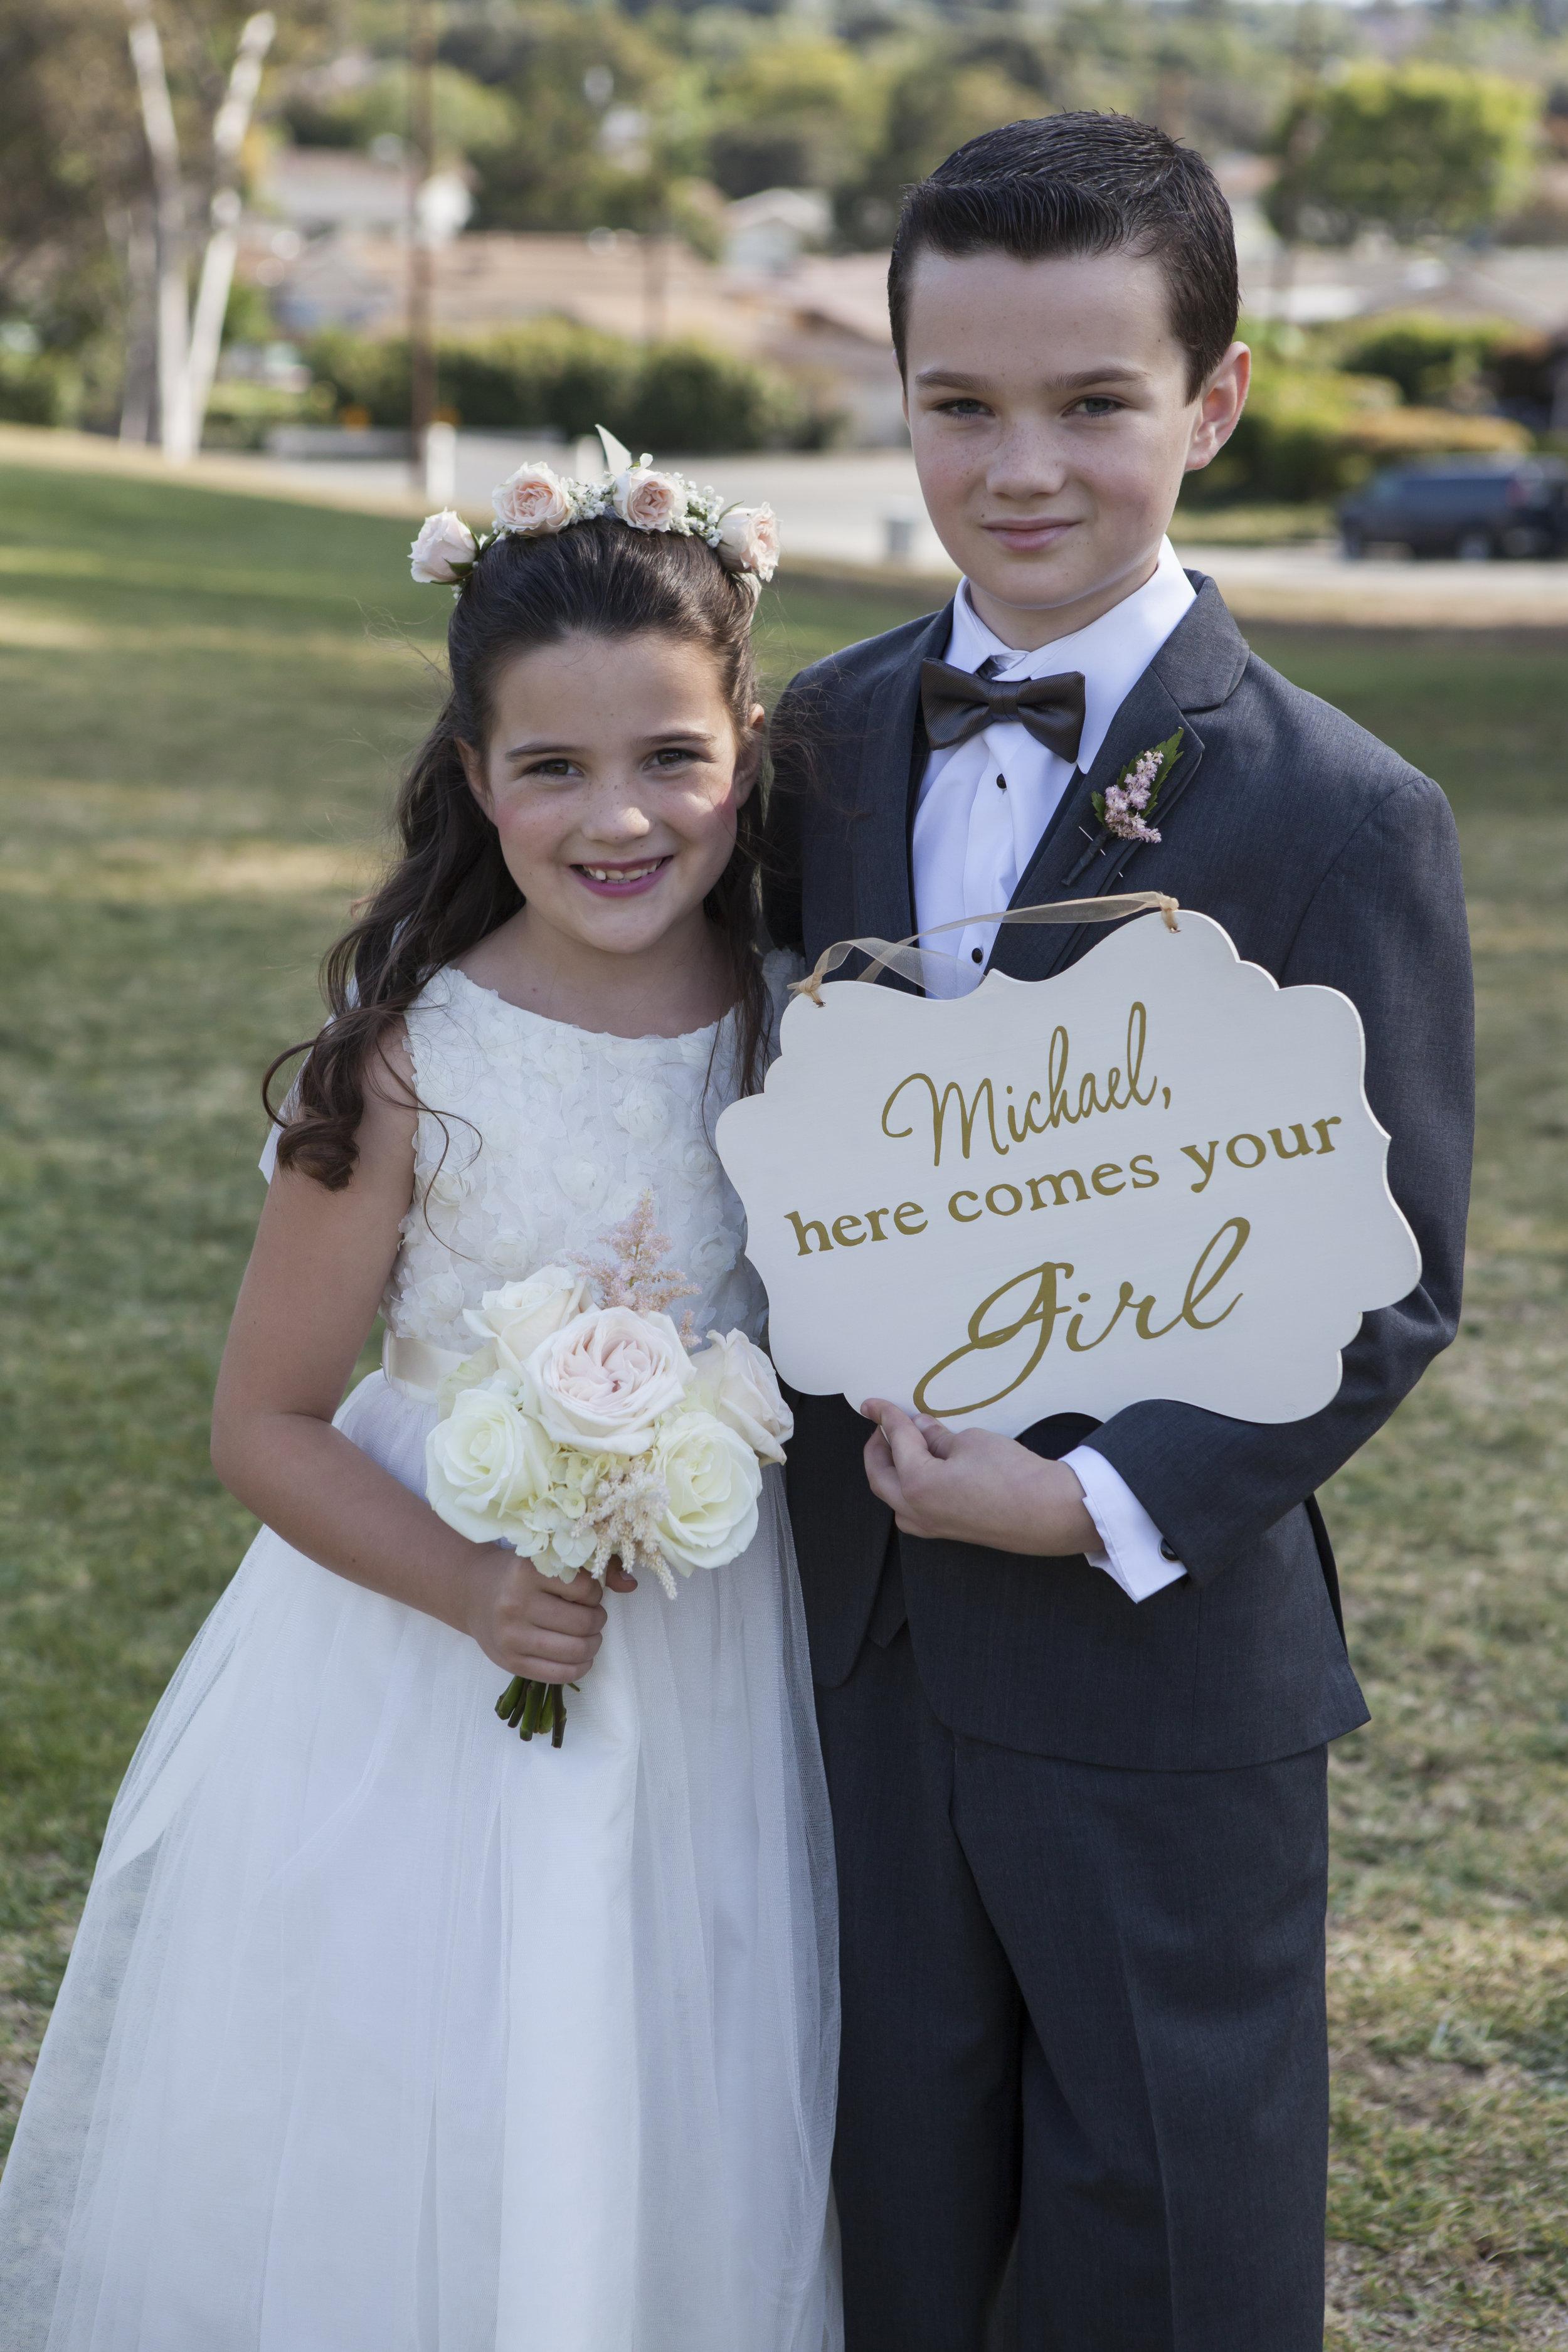 Muckenthaler Wedding Photos_Emily_Michael-551.jpg